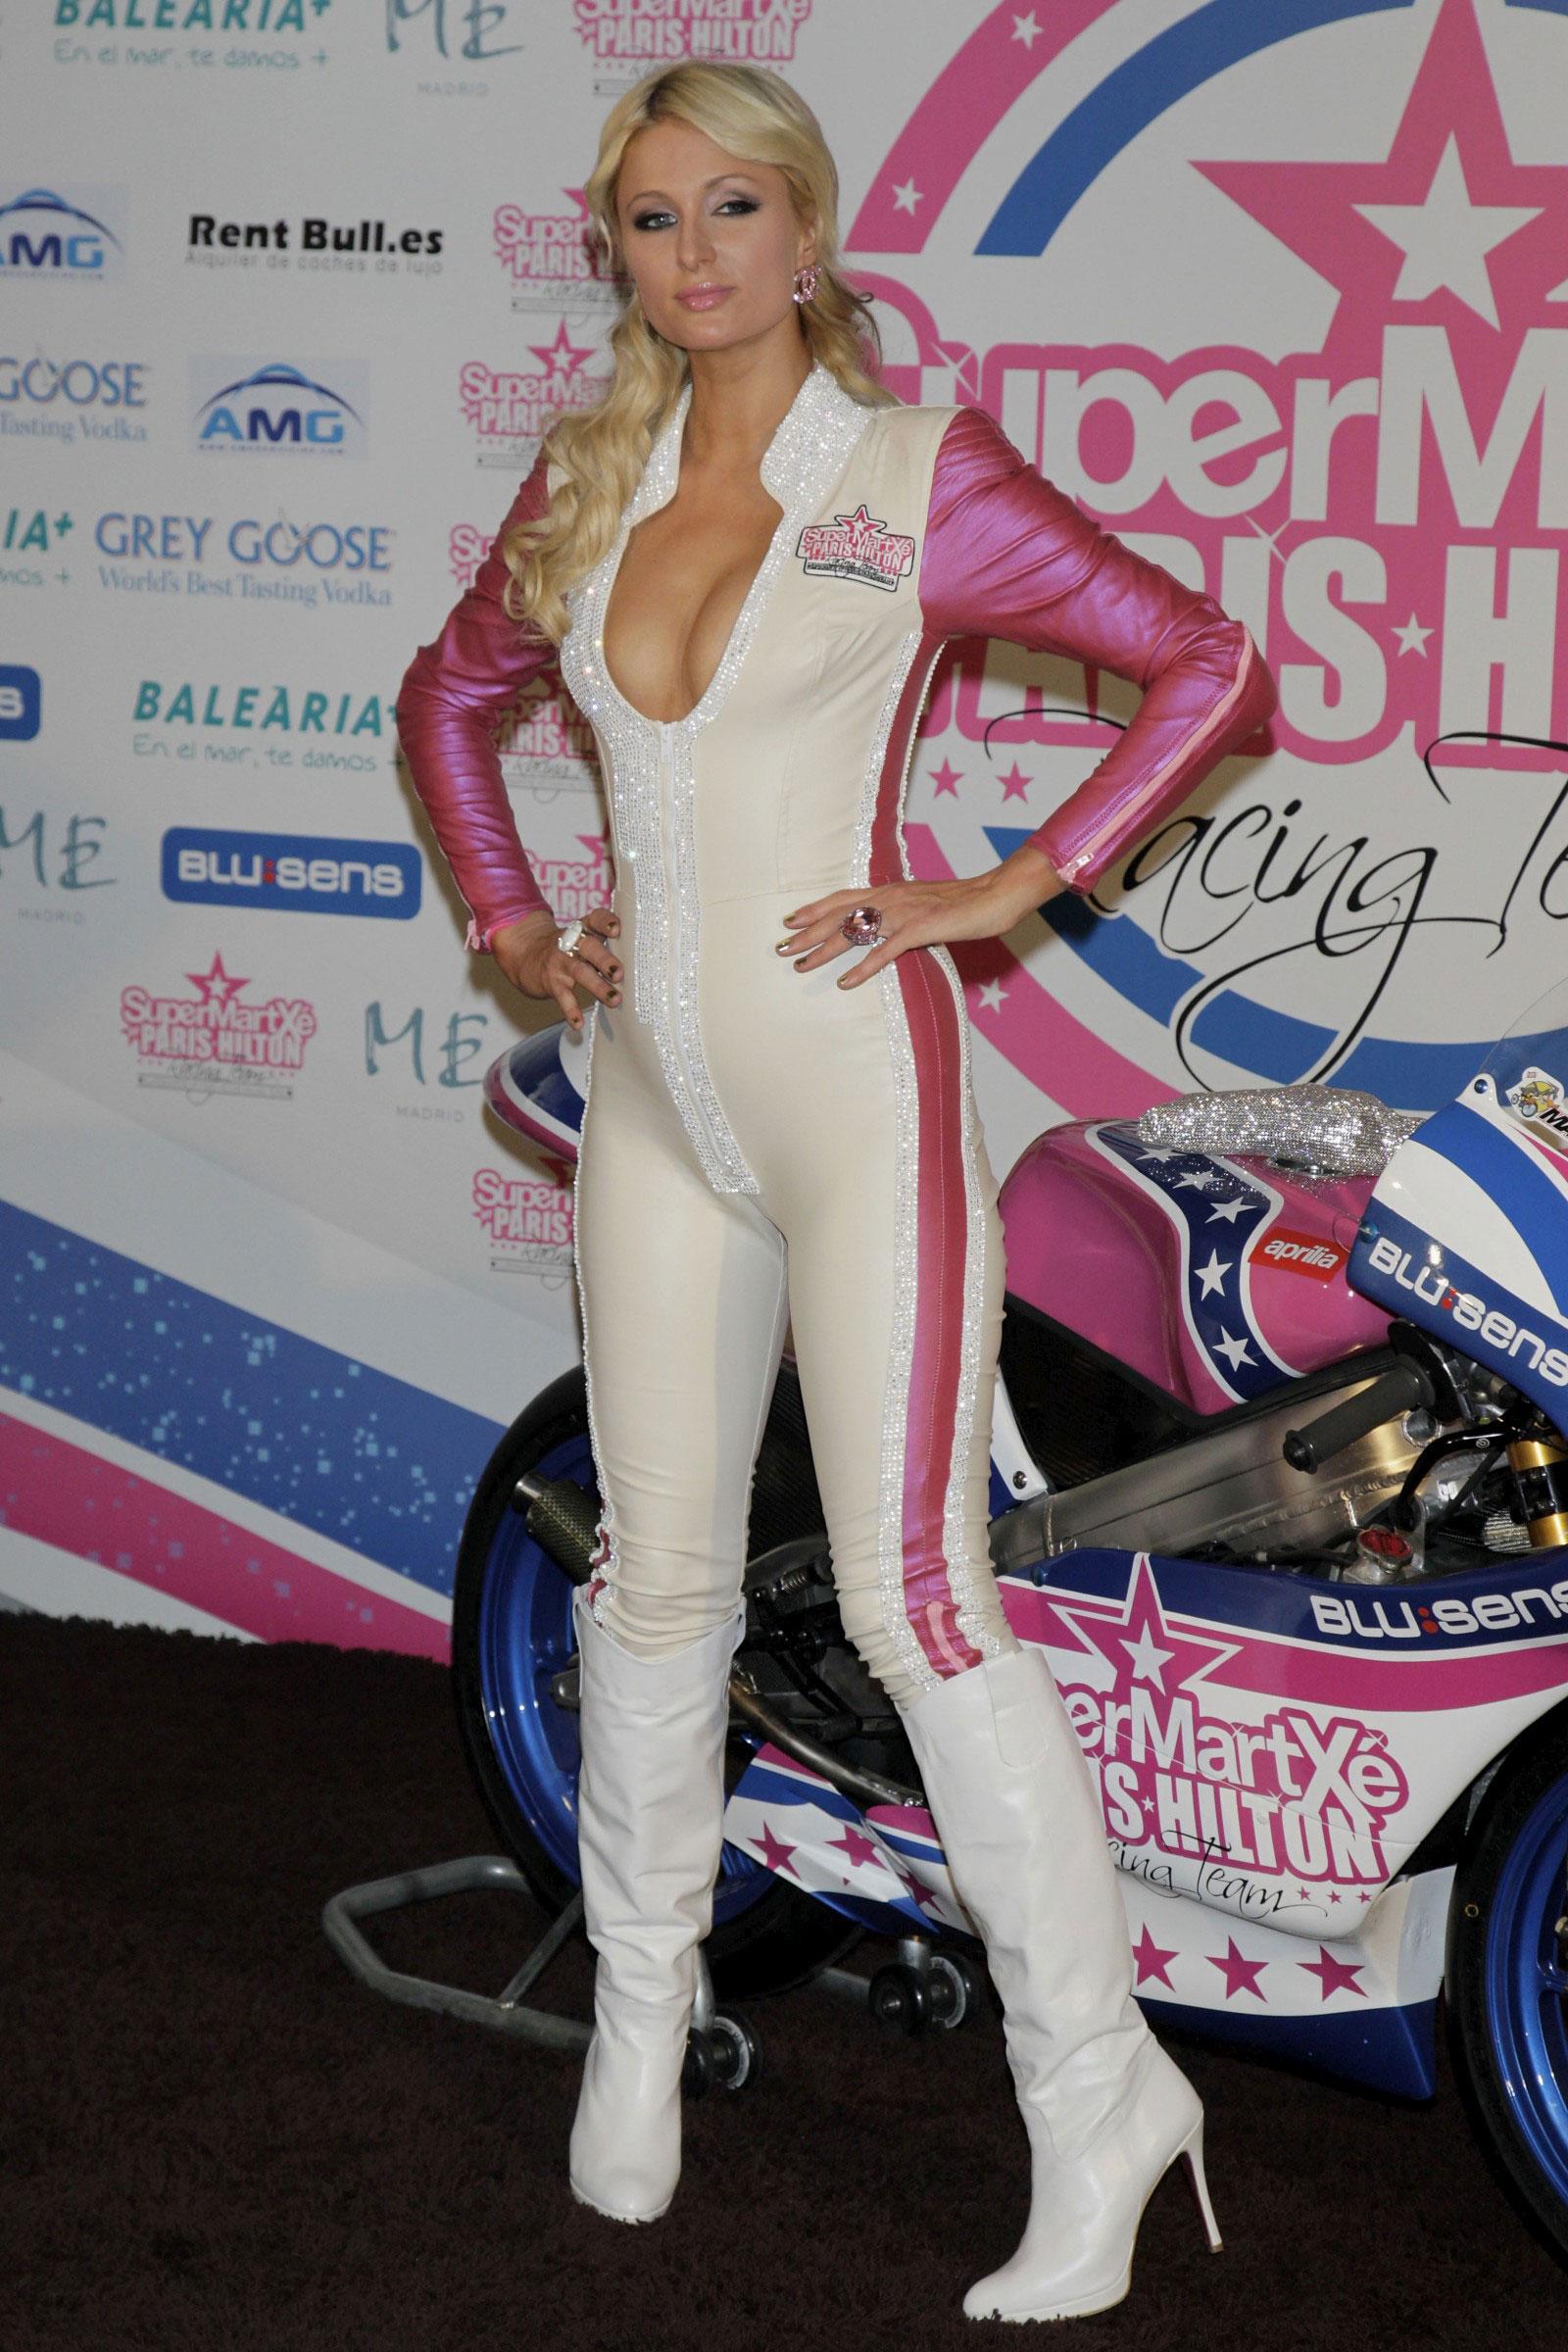 Paris Hilton Launch Supermartxe Vip Motogp Team Extravaganzi